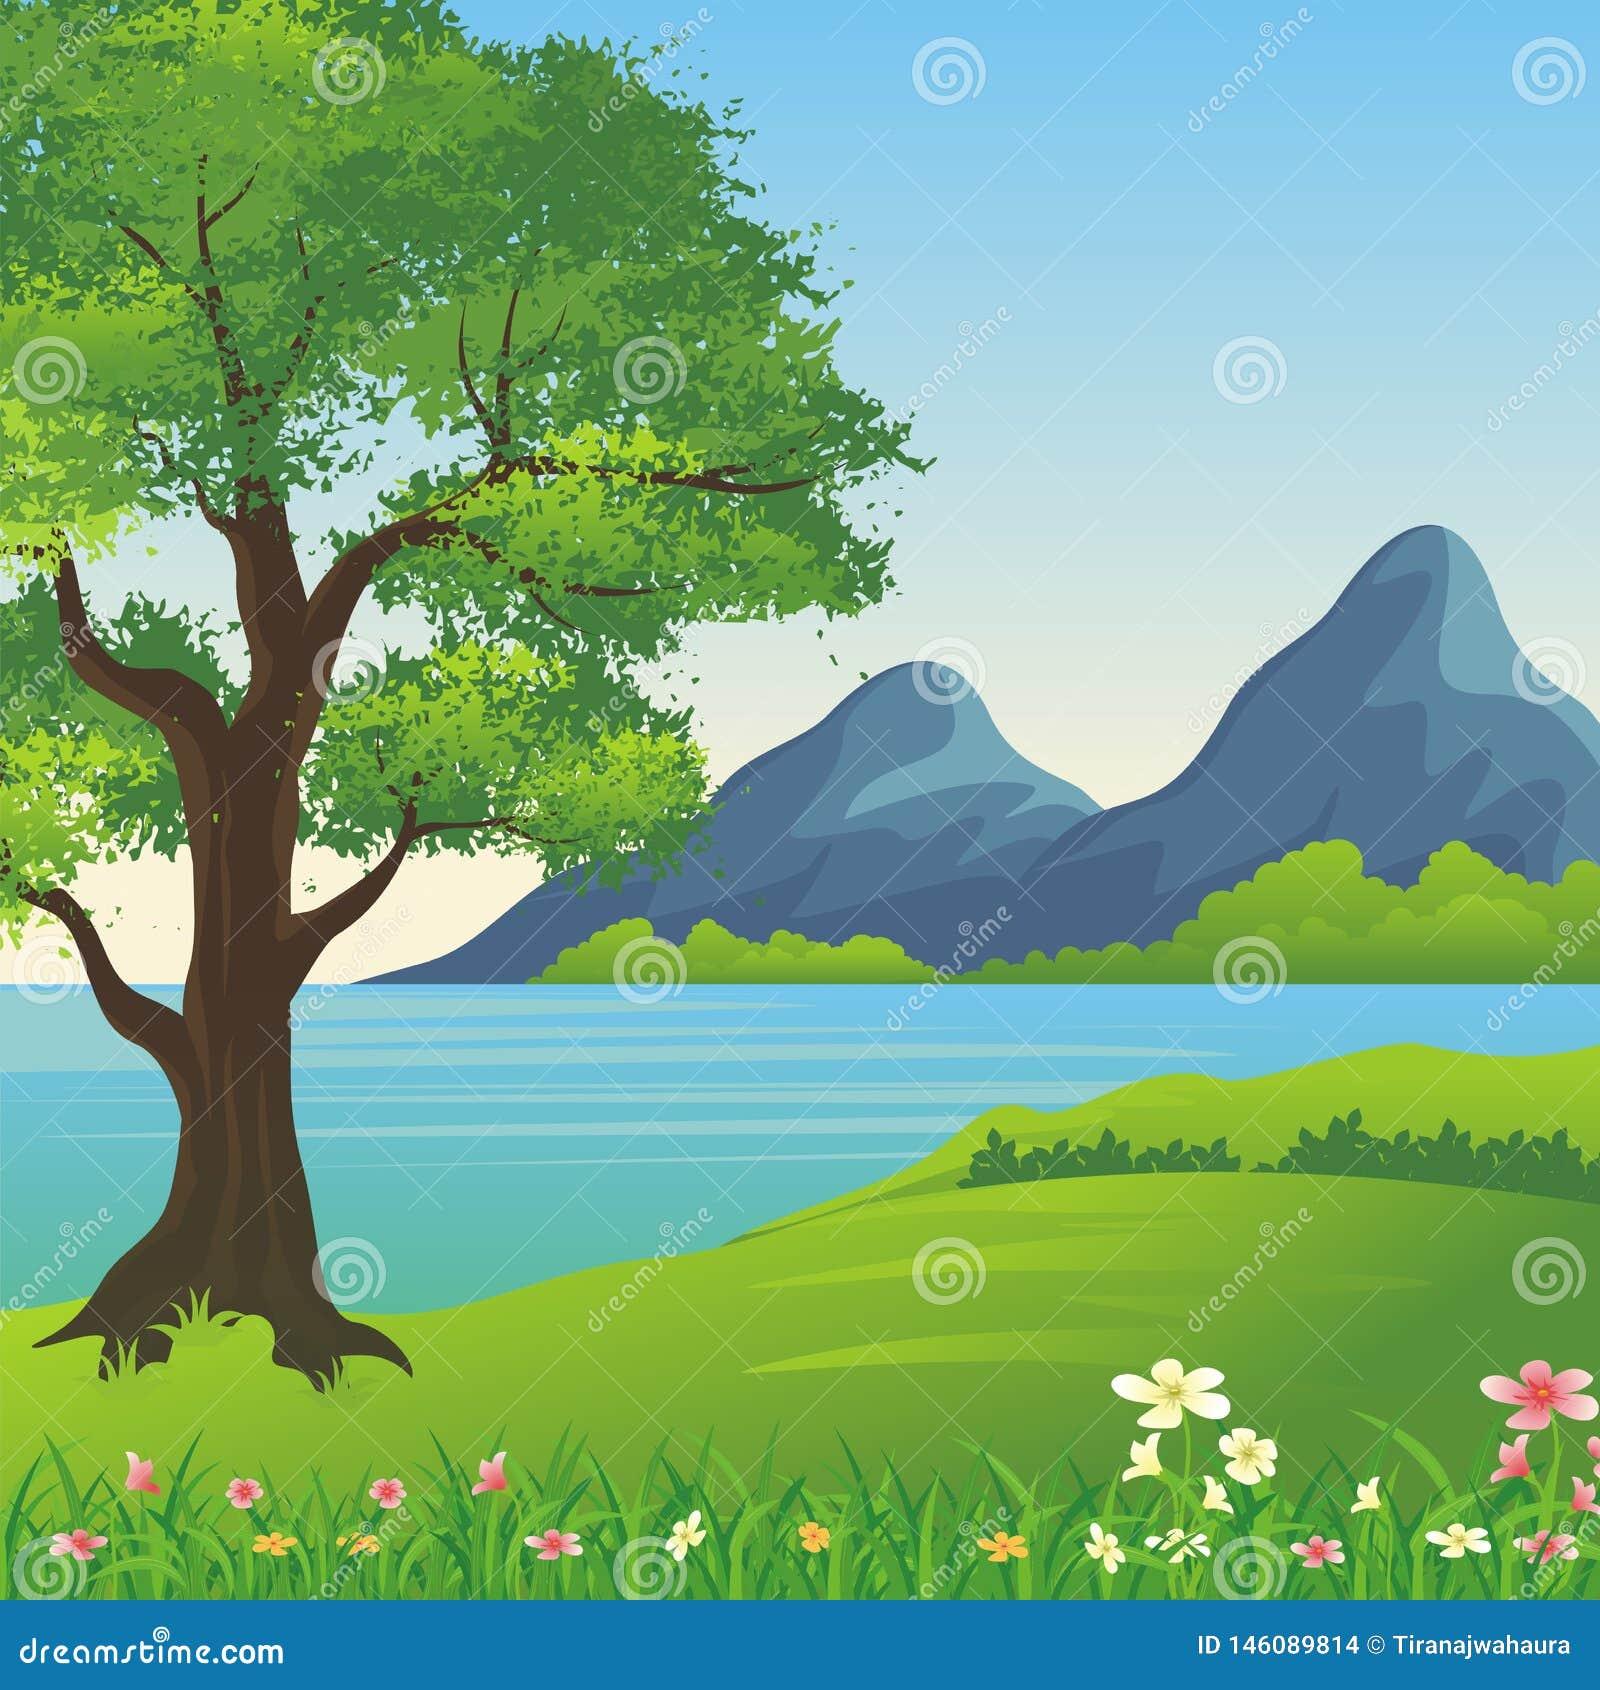 Beautiful landscape, Lovely and cute scenery cartoon design.